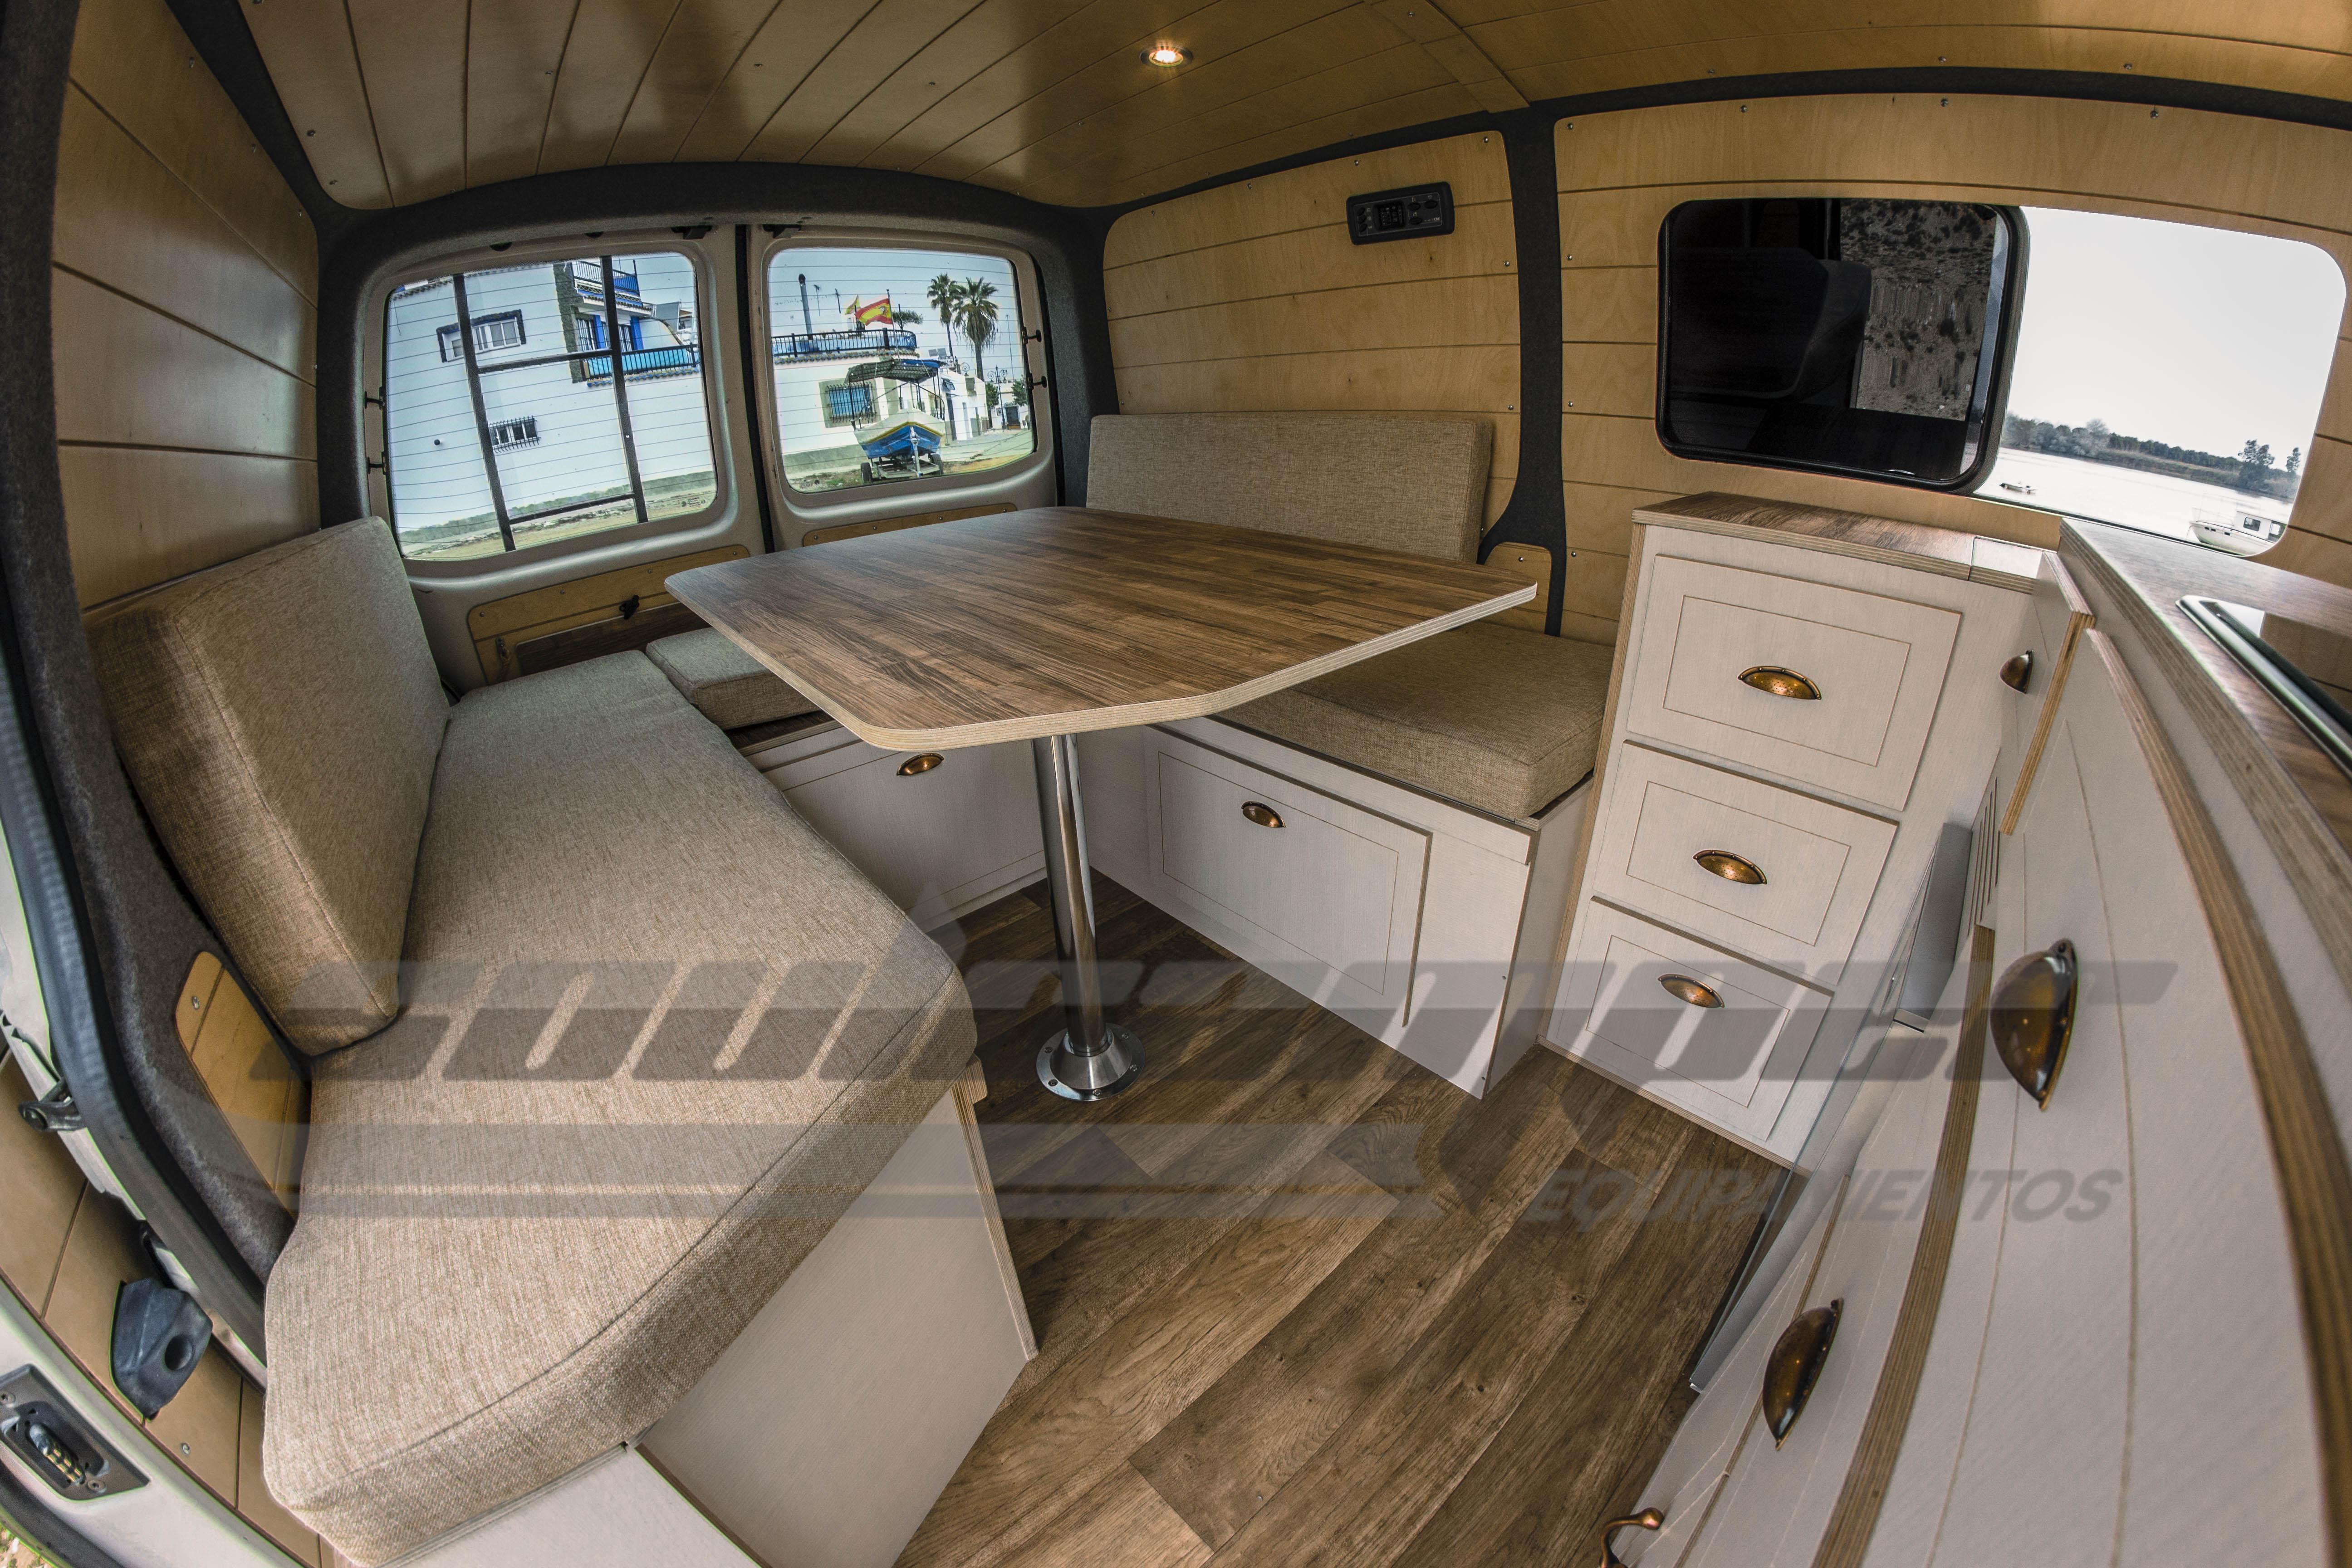 Camperización Transporter T5 VanLife Style